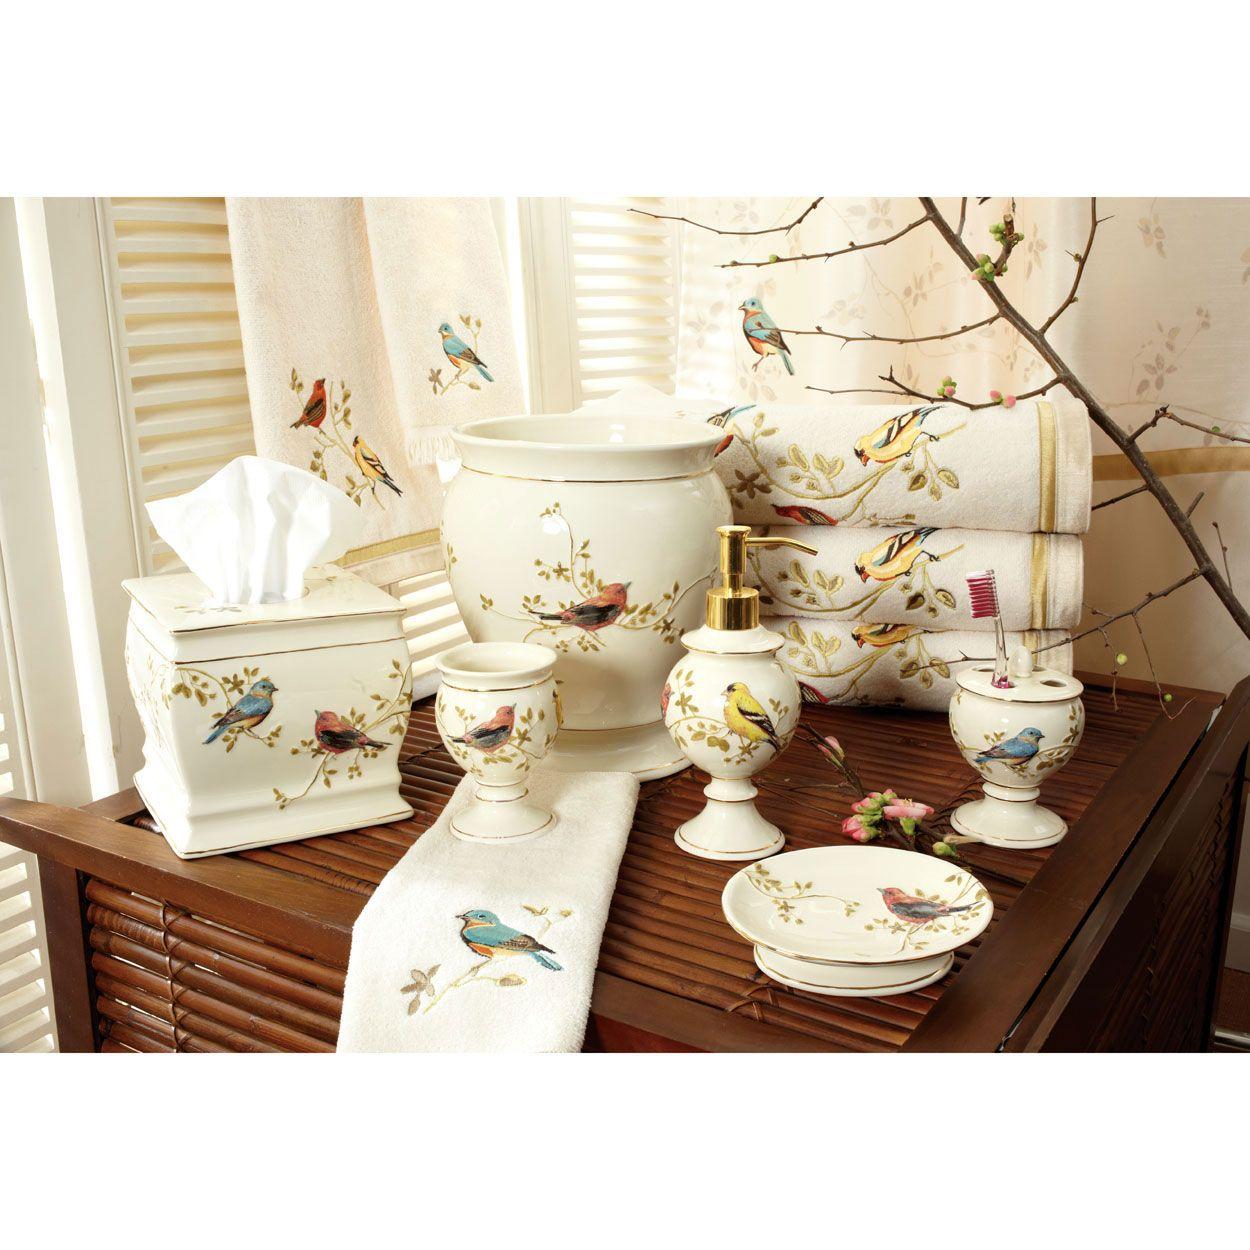 Bird decor bathroom - Gilded Birds Bath Accessories